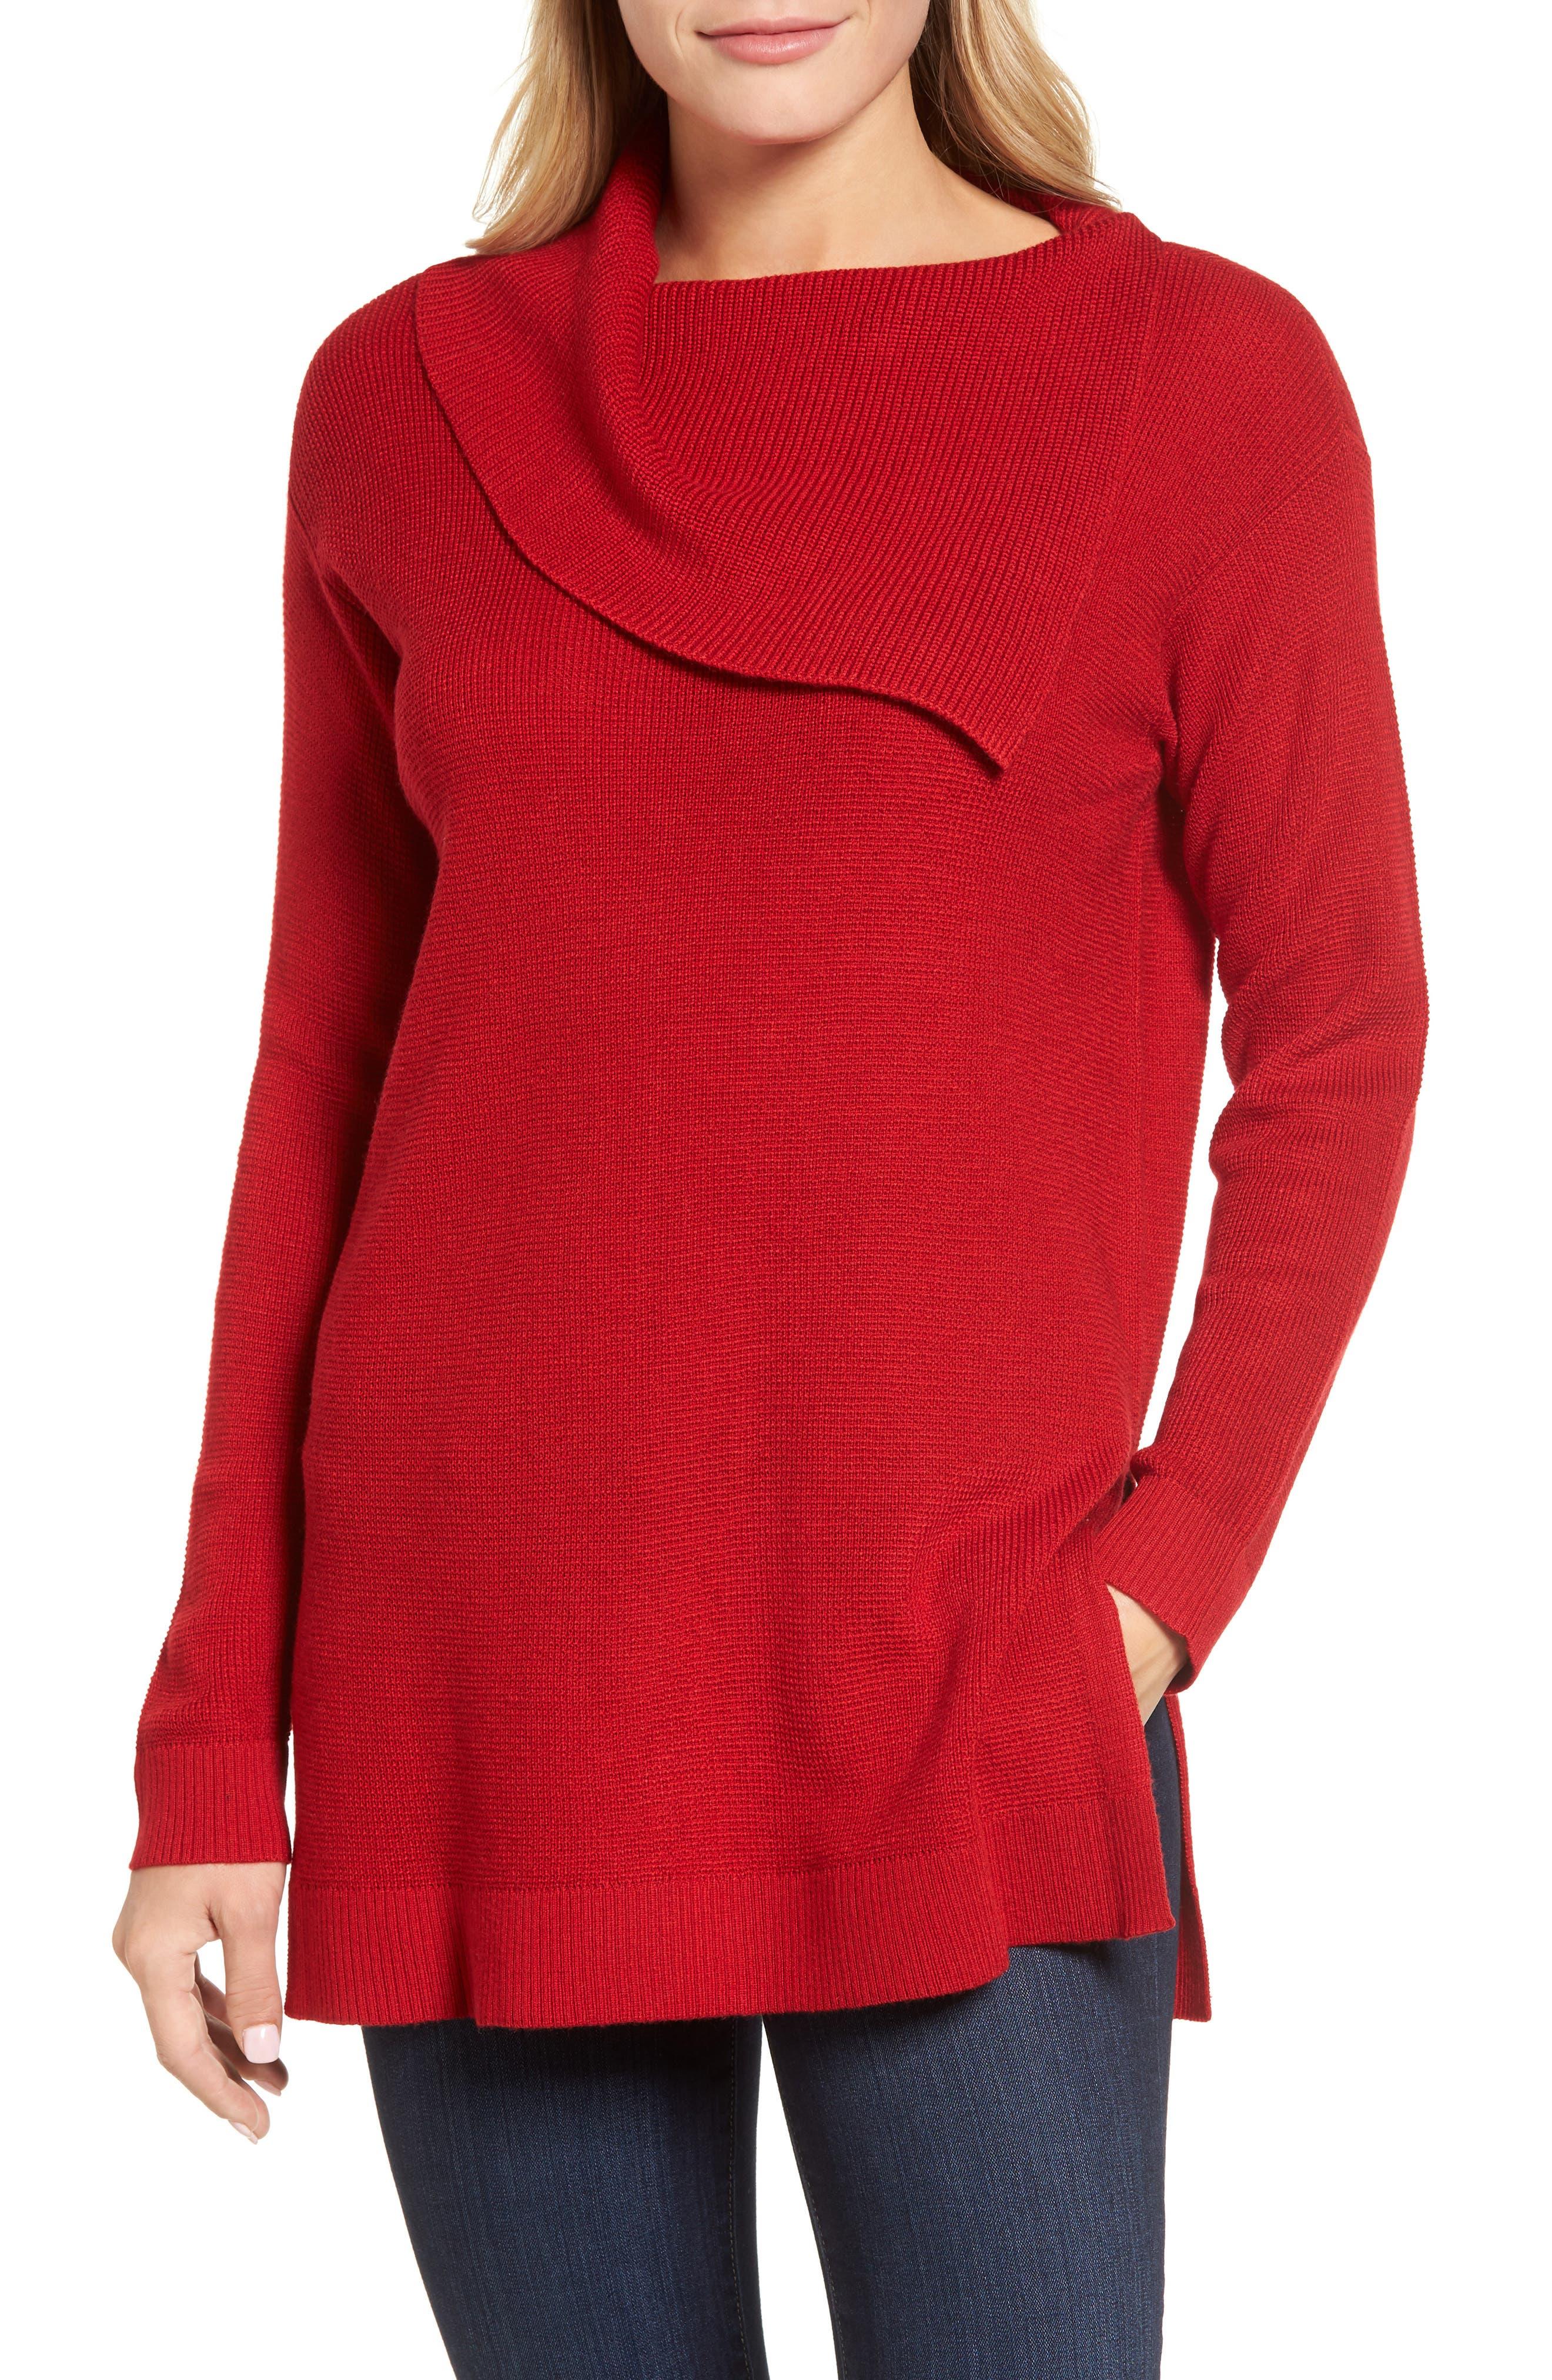 Alternate Image 1 Selected - Vince Camuto Sweater (Regular & Petite)